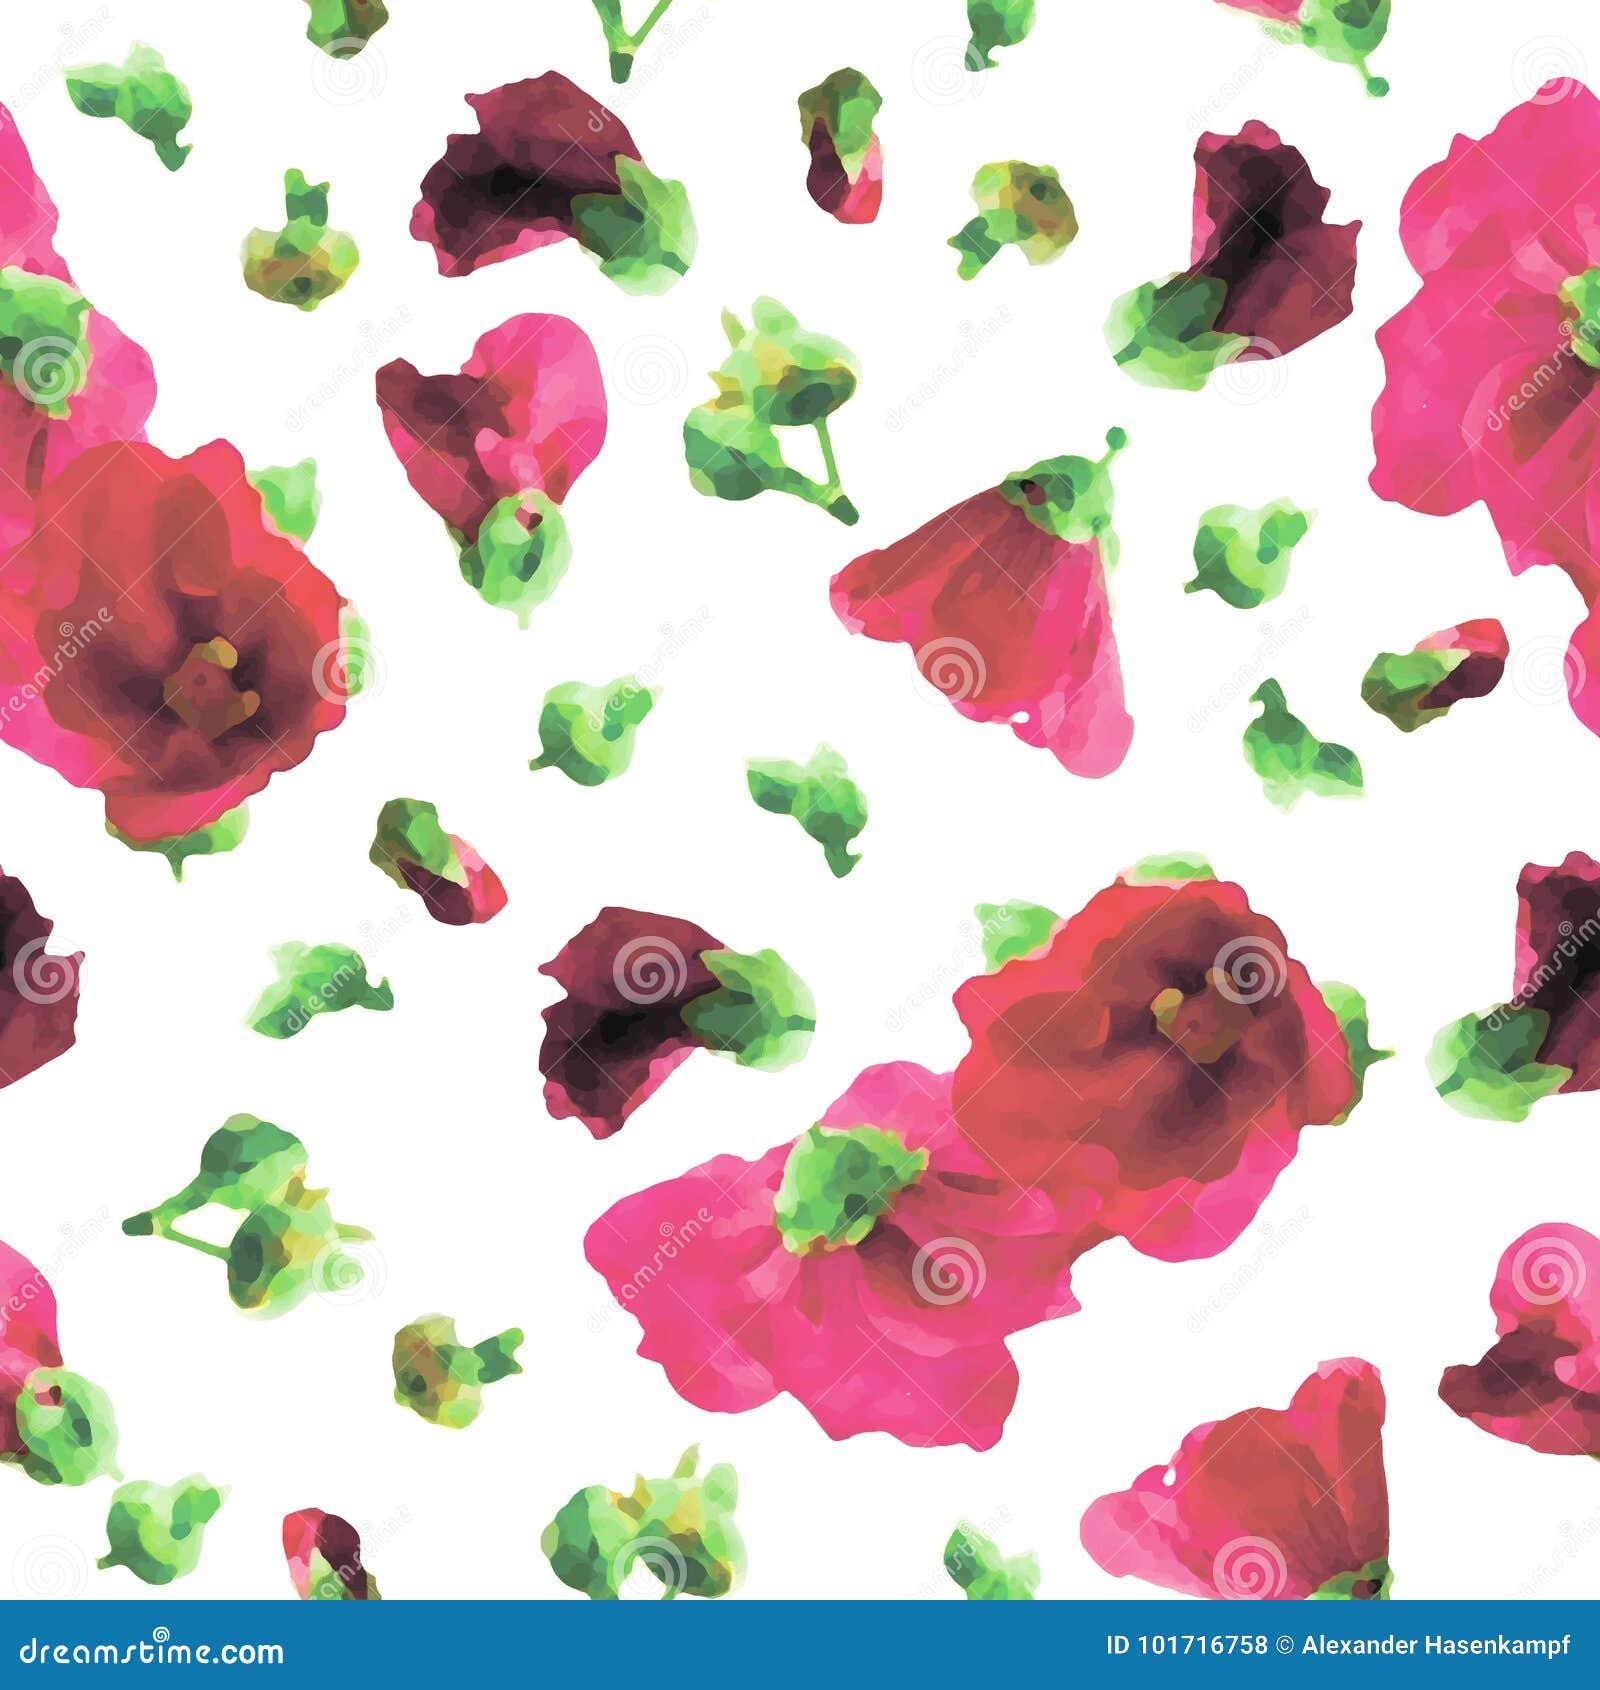 Roze Stokrozen Naadloos Patroon - Illustratie